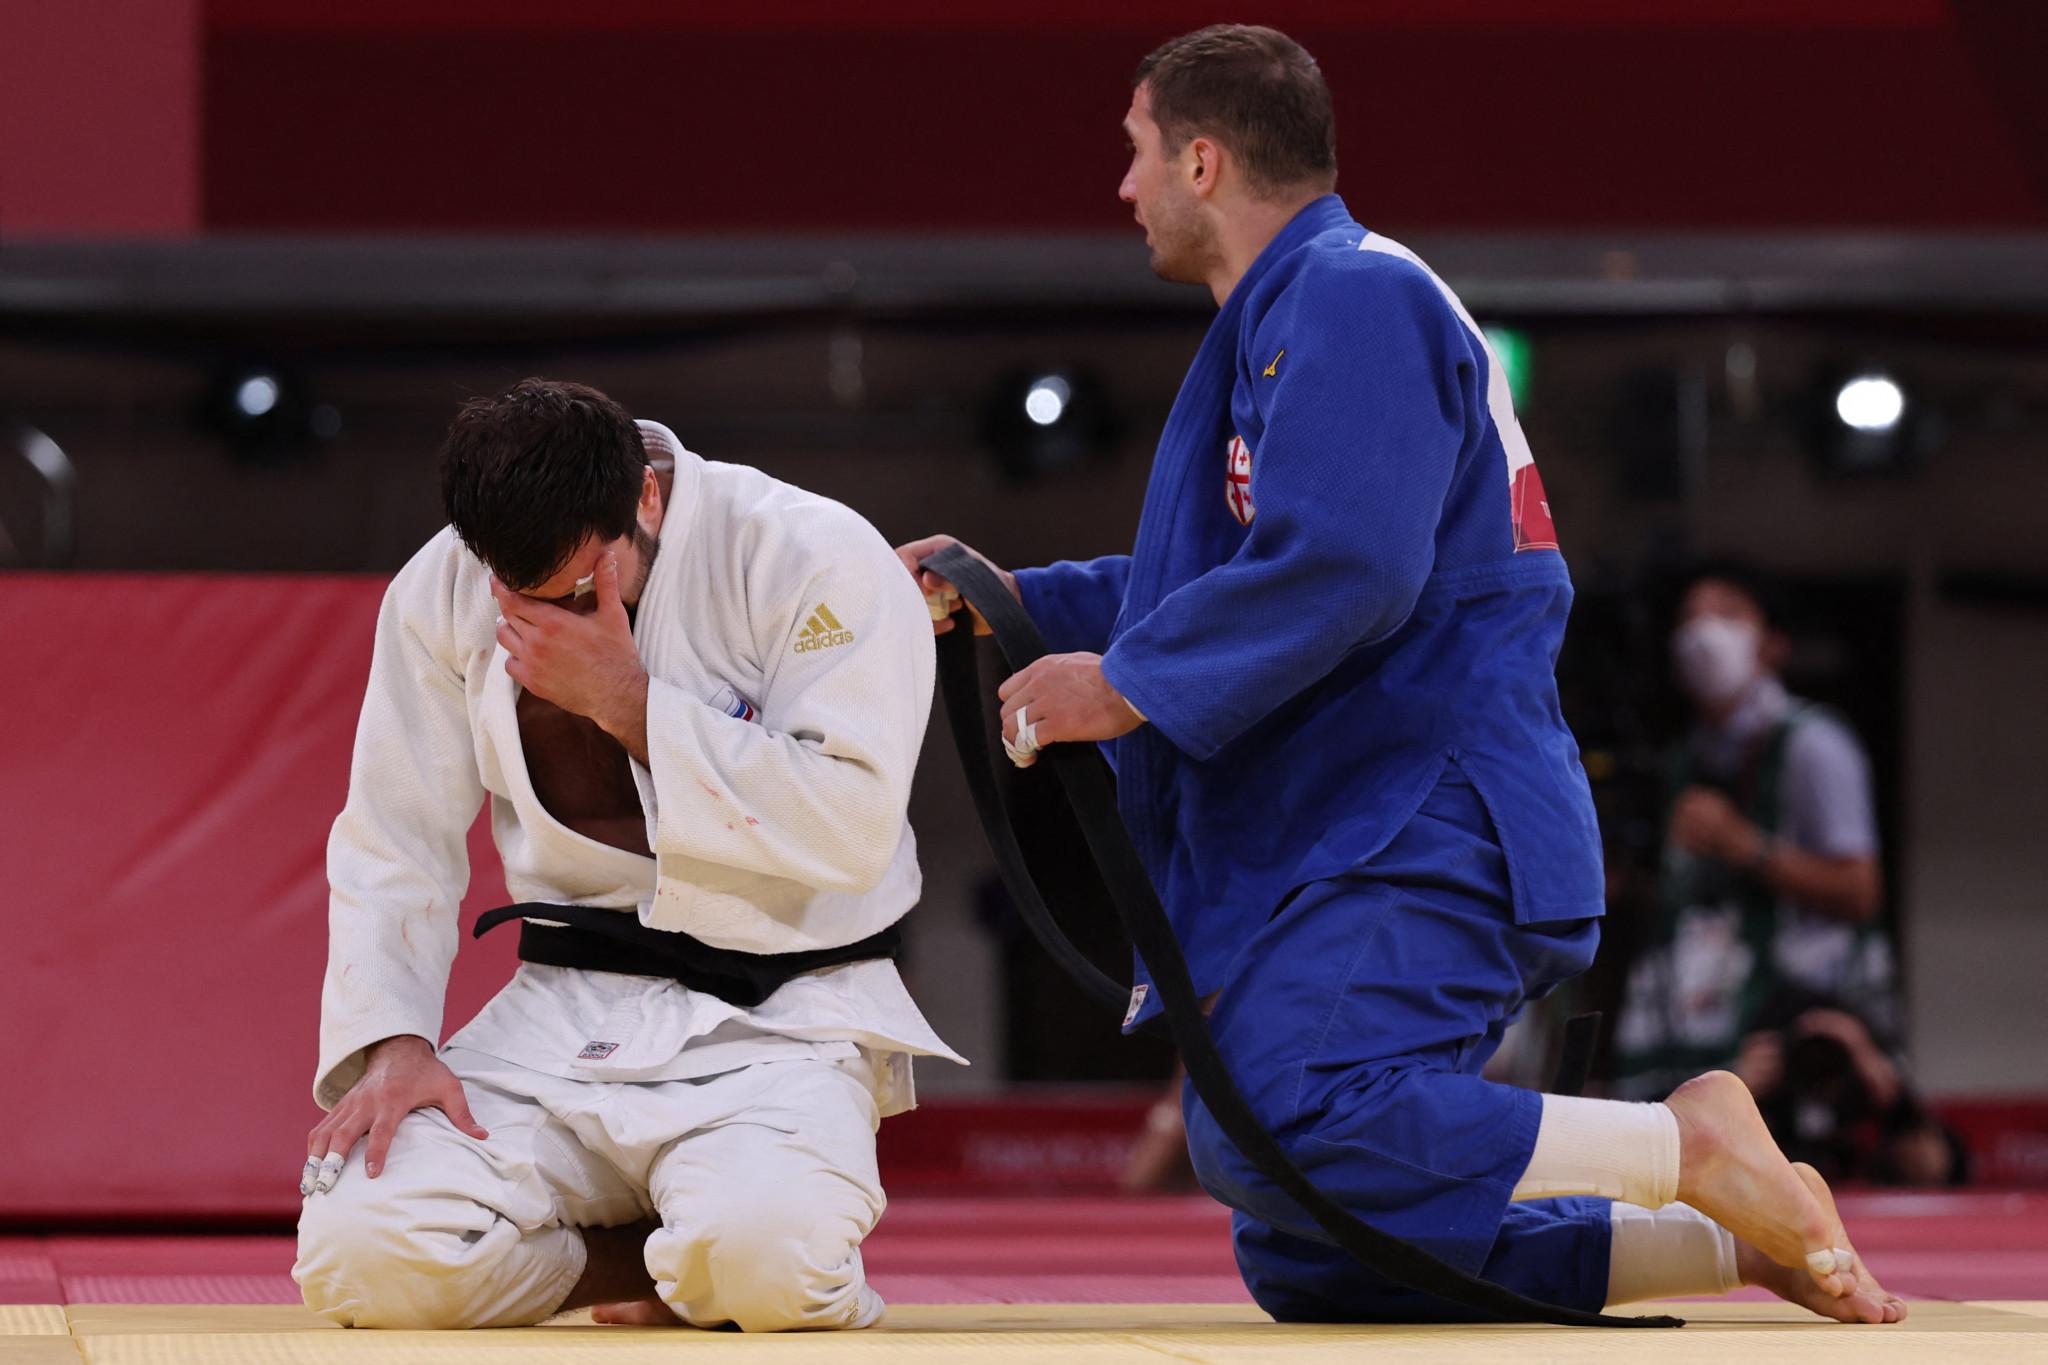 Niiaz Iliasov broke down in tears after beating Varlam Liparteliani in the bronze medal bout ©Getty Images